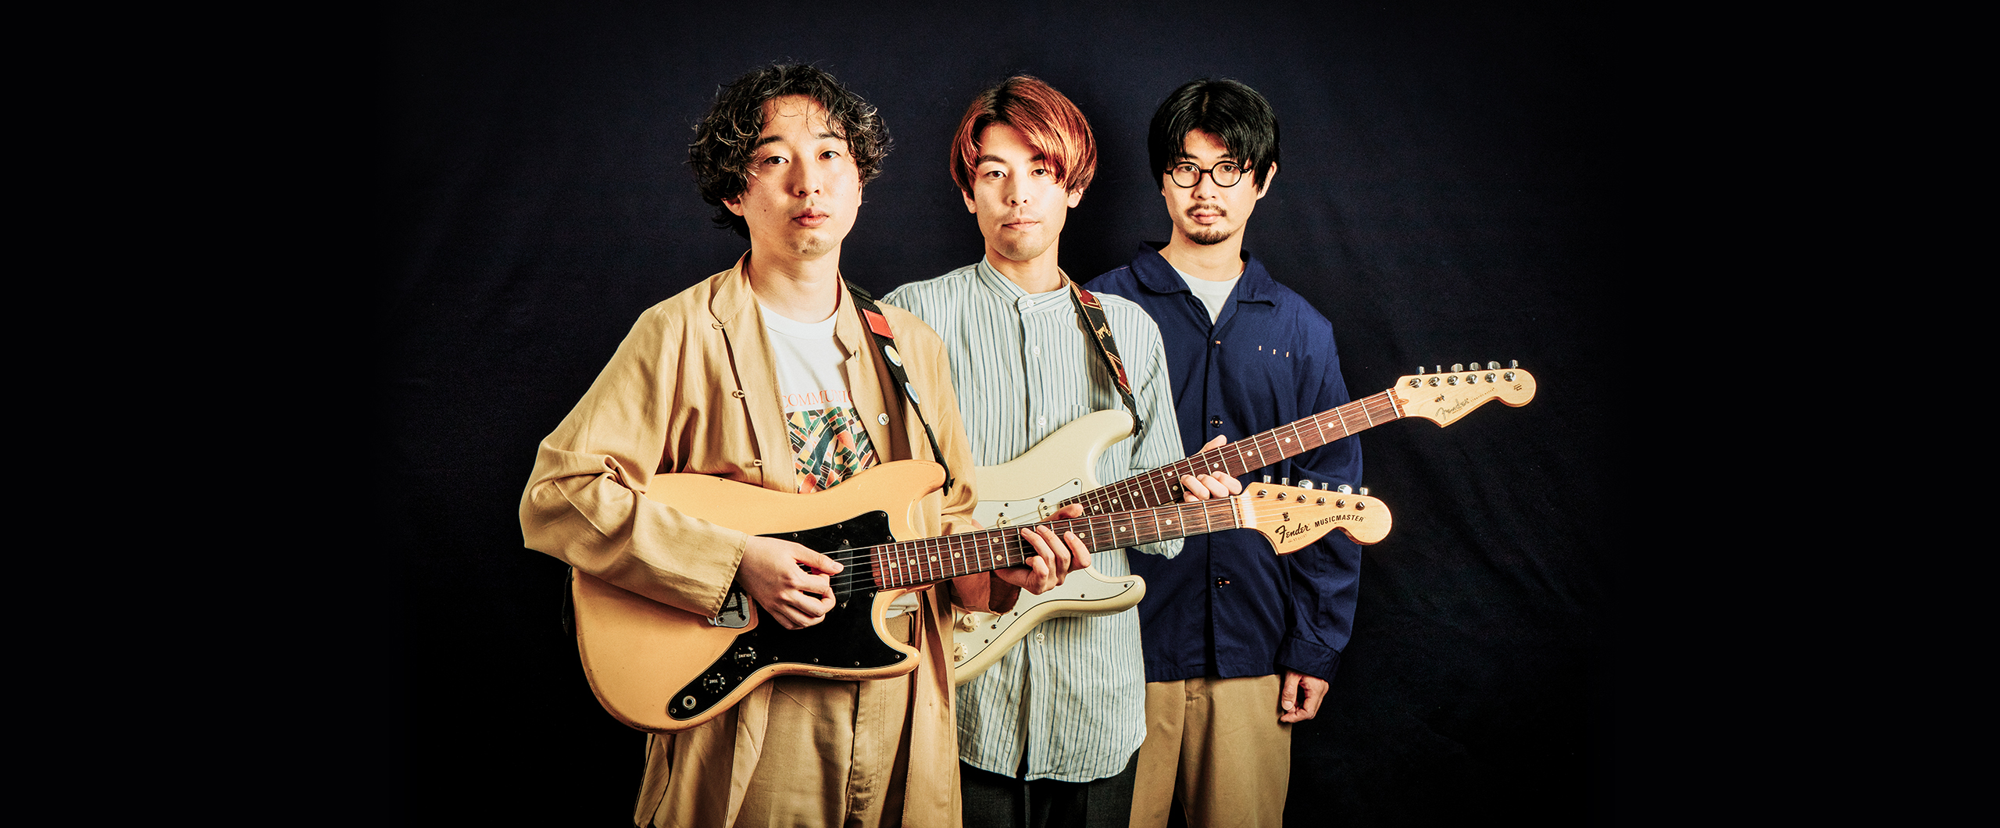 Interview 有馬嵩将&荏原優太郎(THE TREES)×菅原慎一元シャムキャッツのギタリストがプロデュース! きらびやかなギターポップ・バンドの魅力とは?